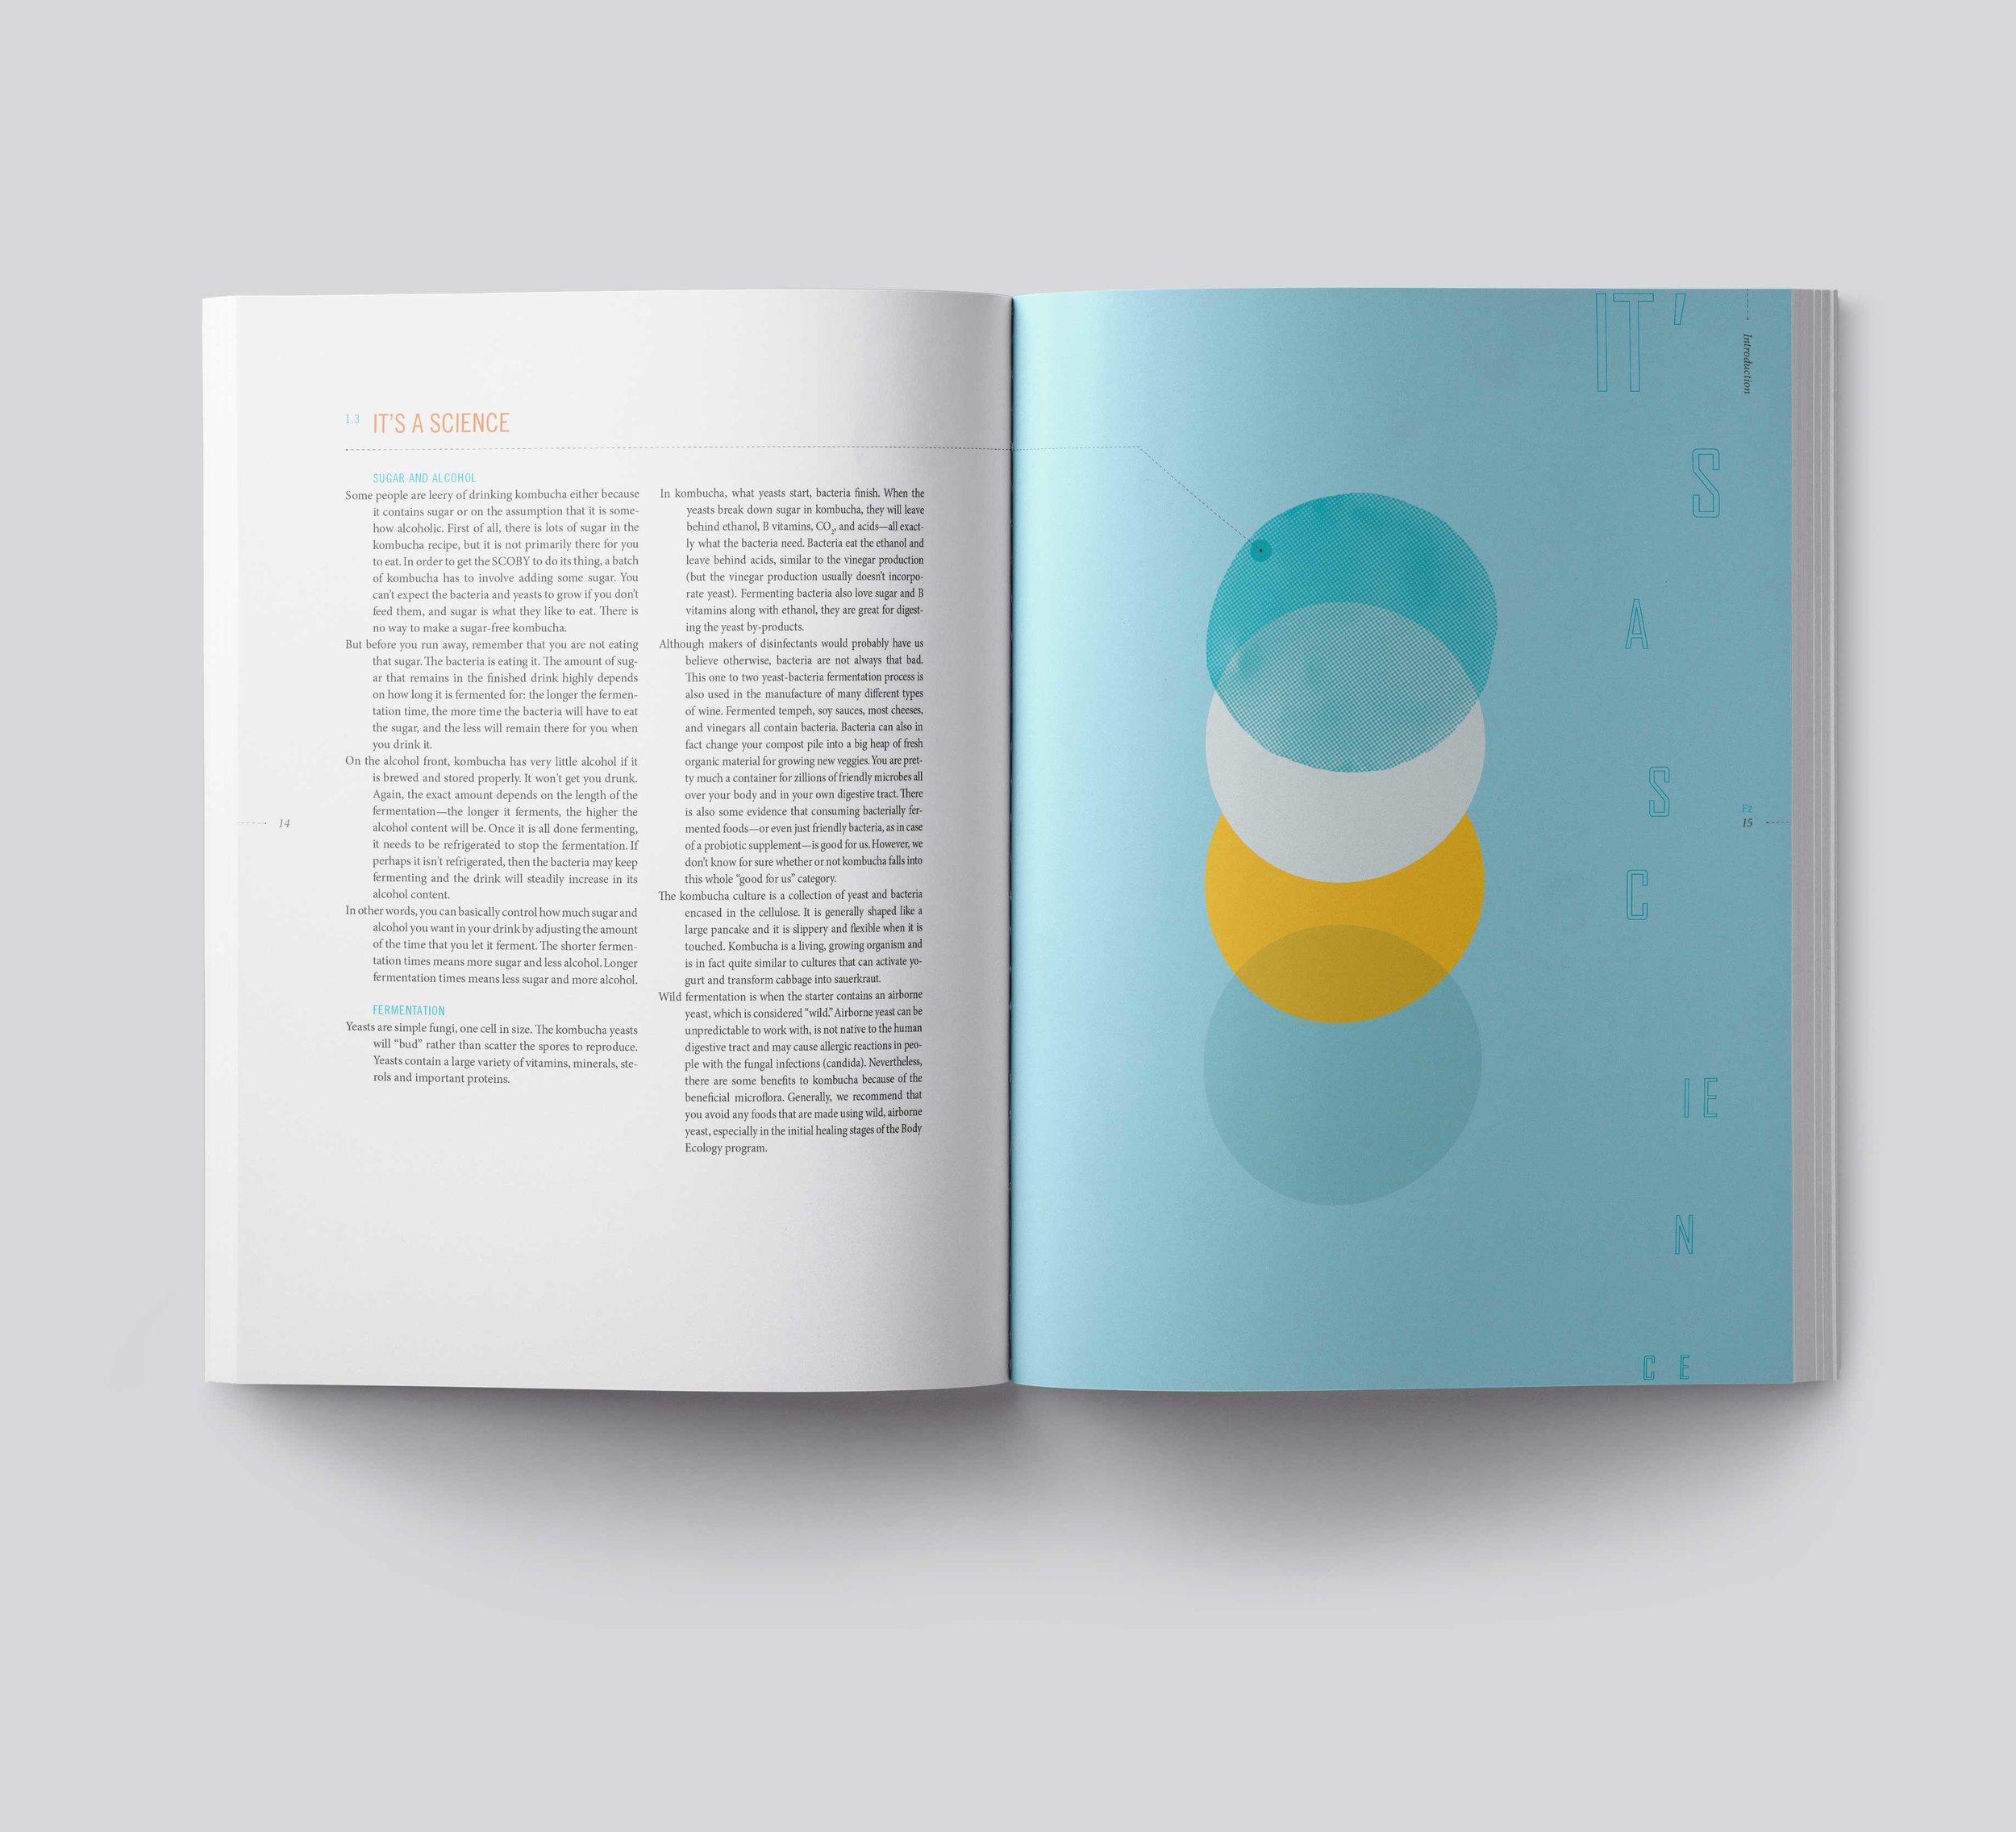 Magazine-USLetter-A4-Mockup-Template_2_1_LOW.jpg